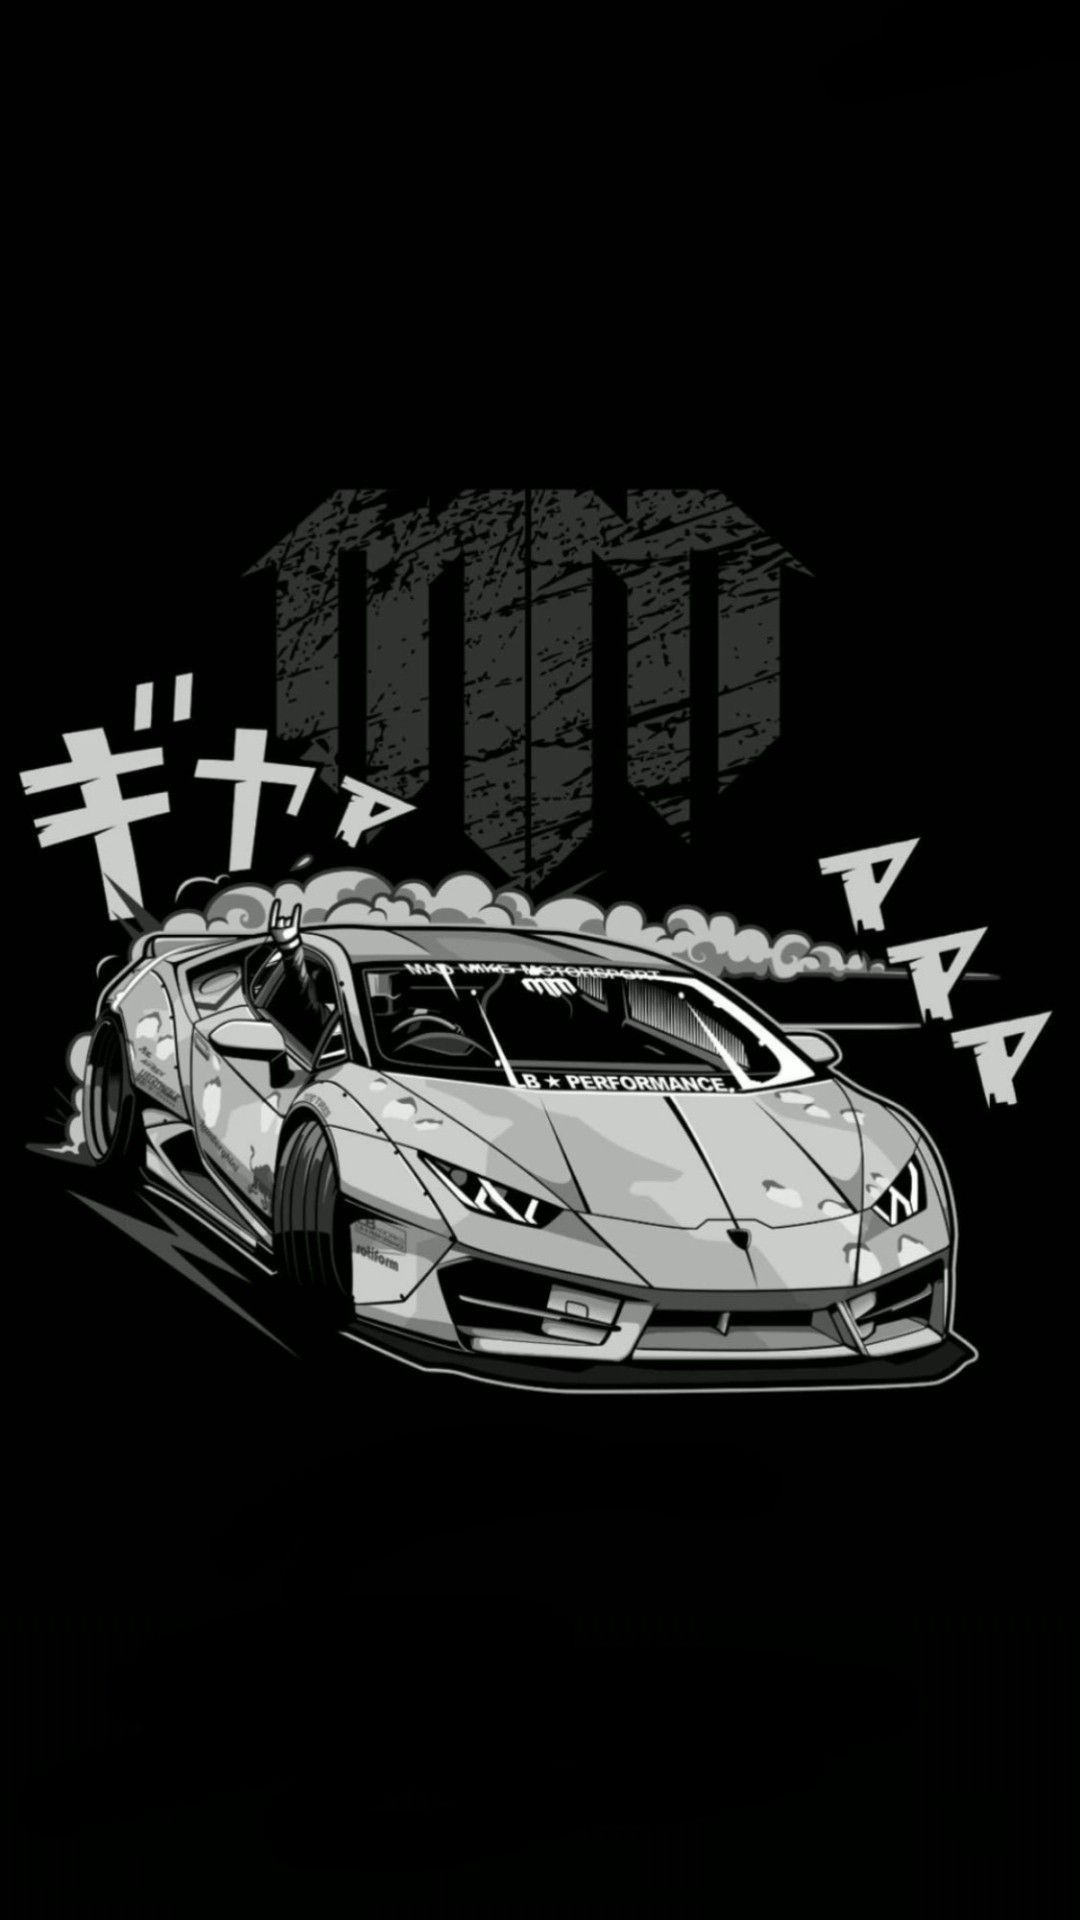 Mad Mike   Drift Lamborghini Huracan Wallpaper for Phone